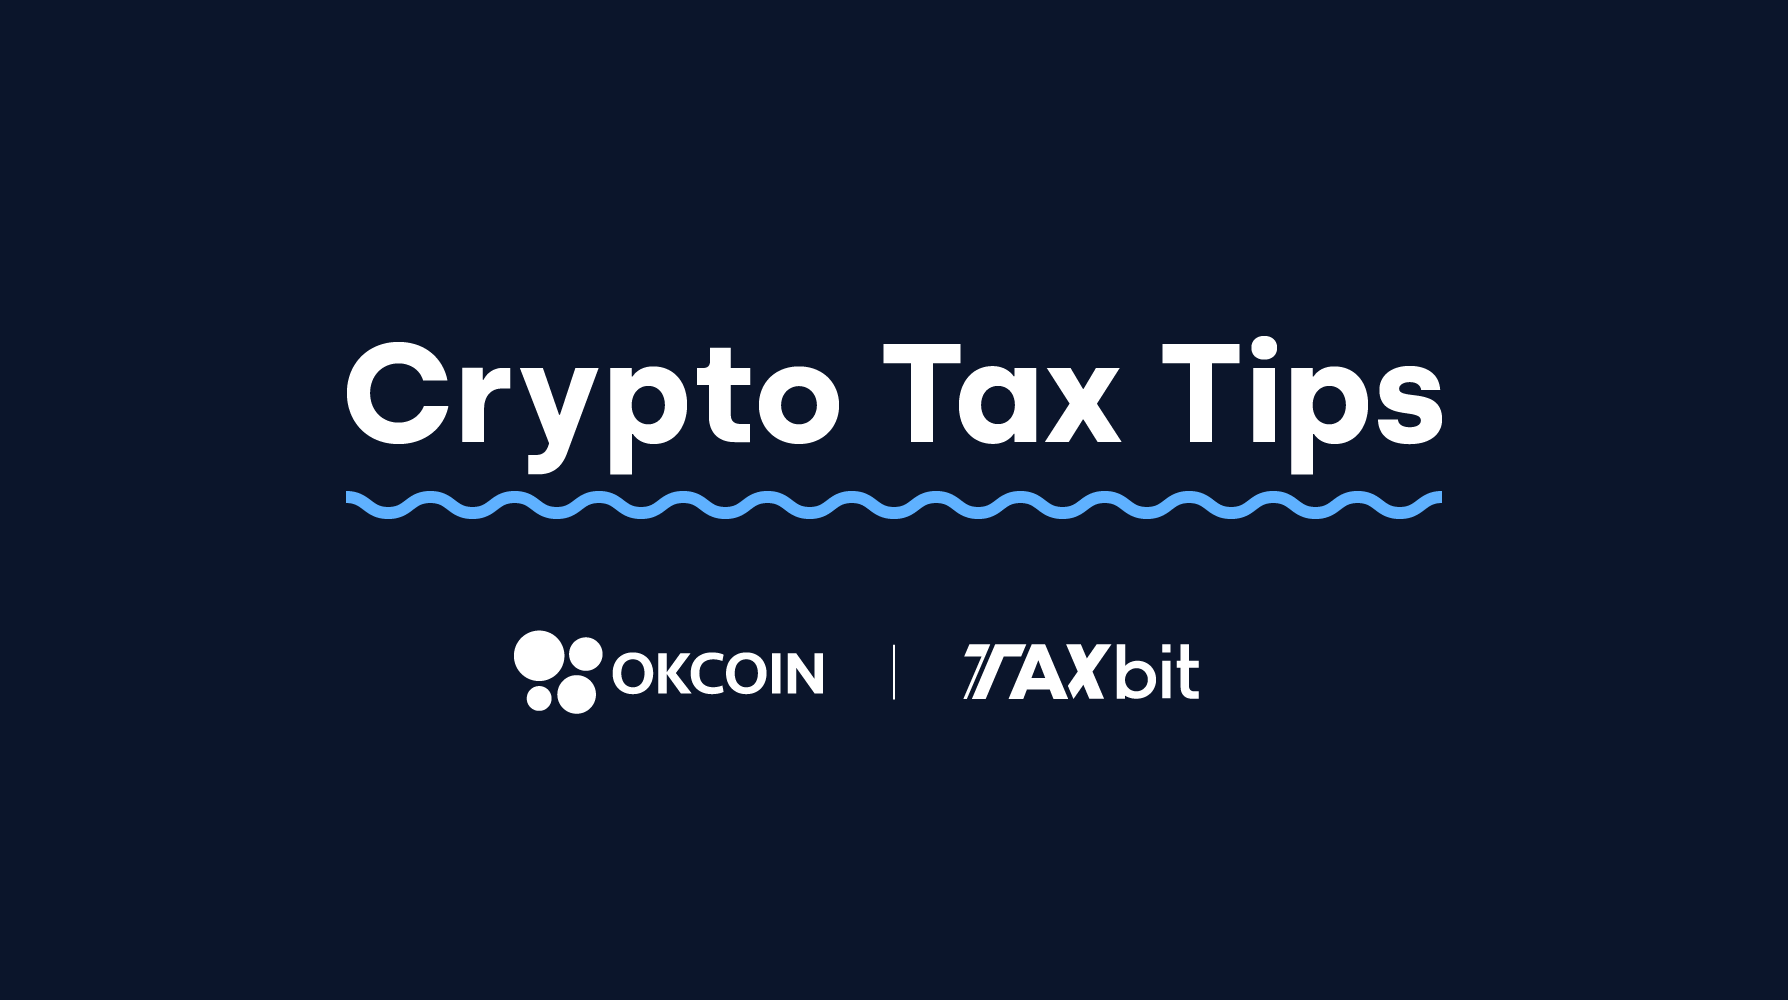 TaxBit and OKCoin image